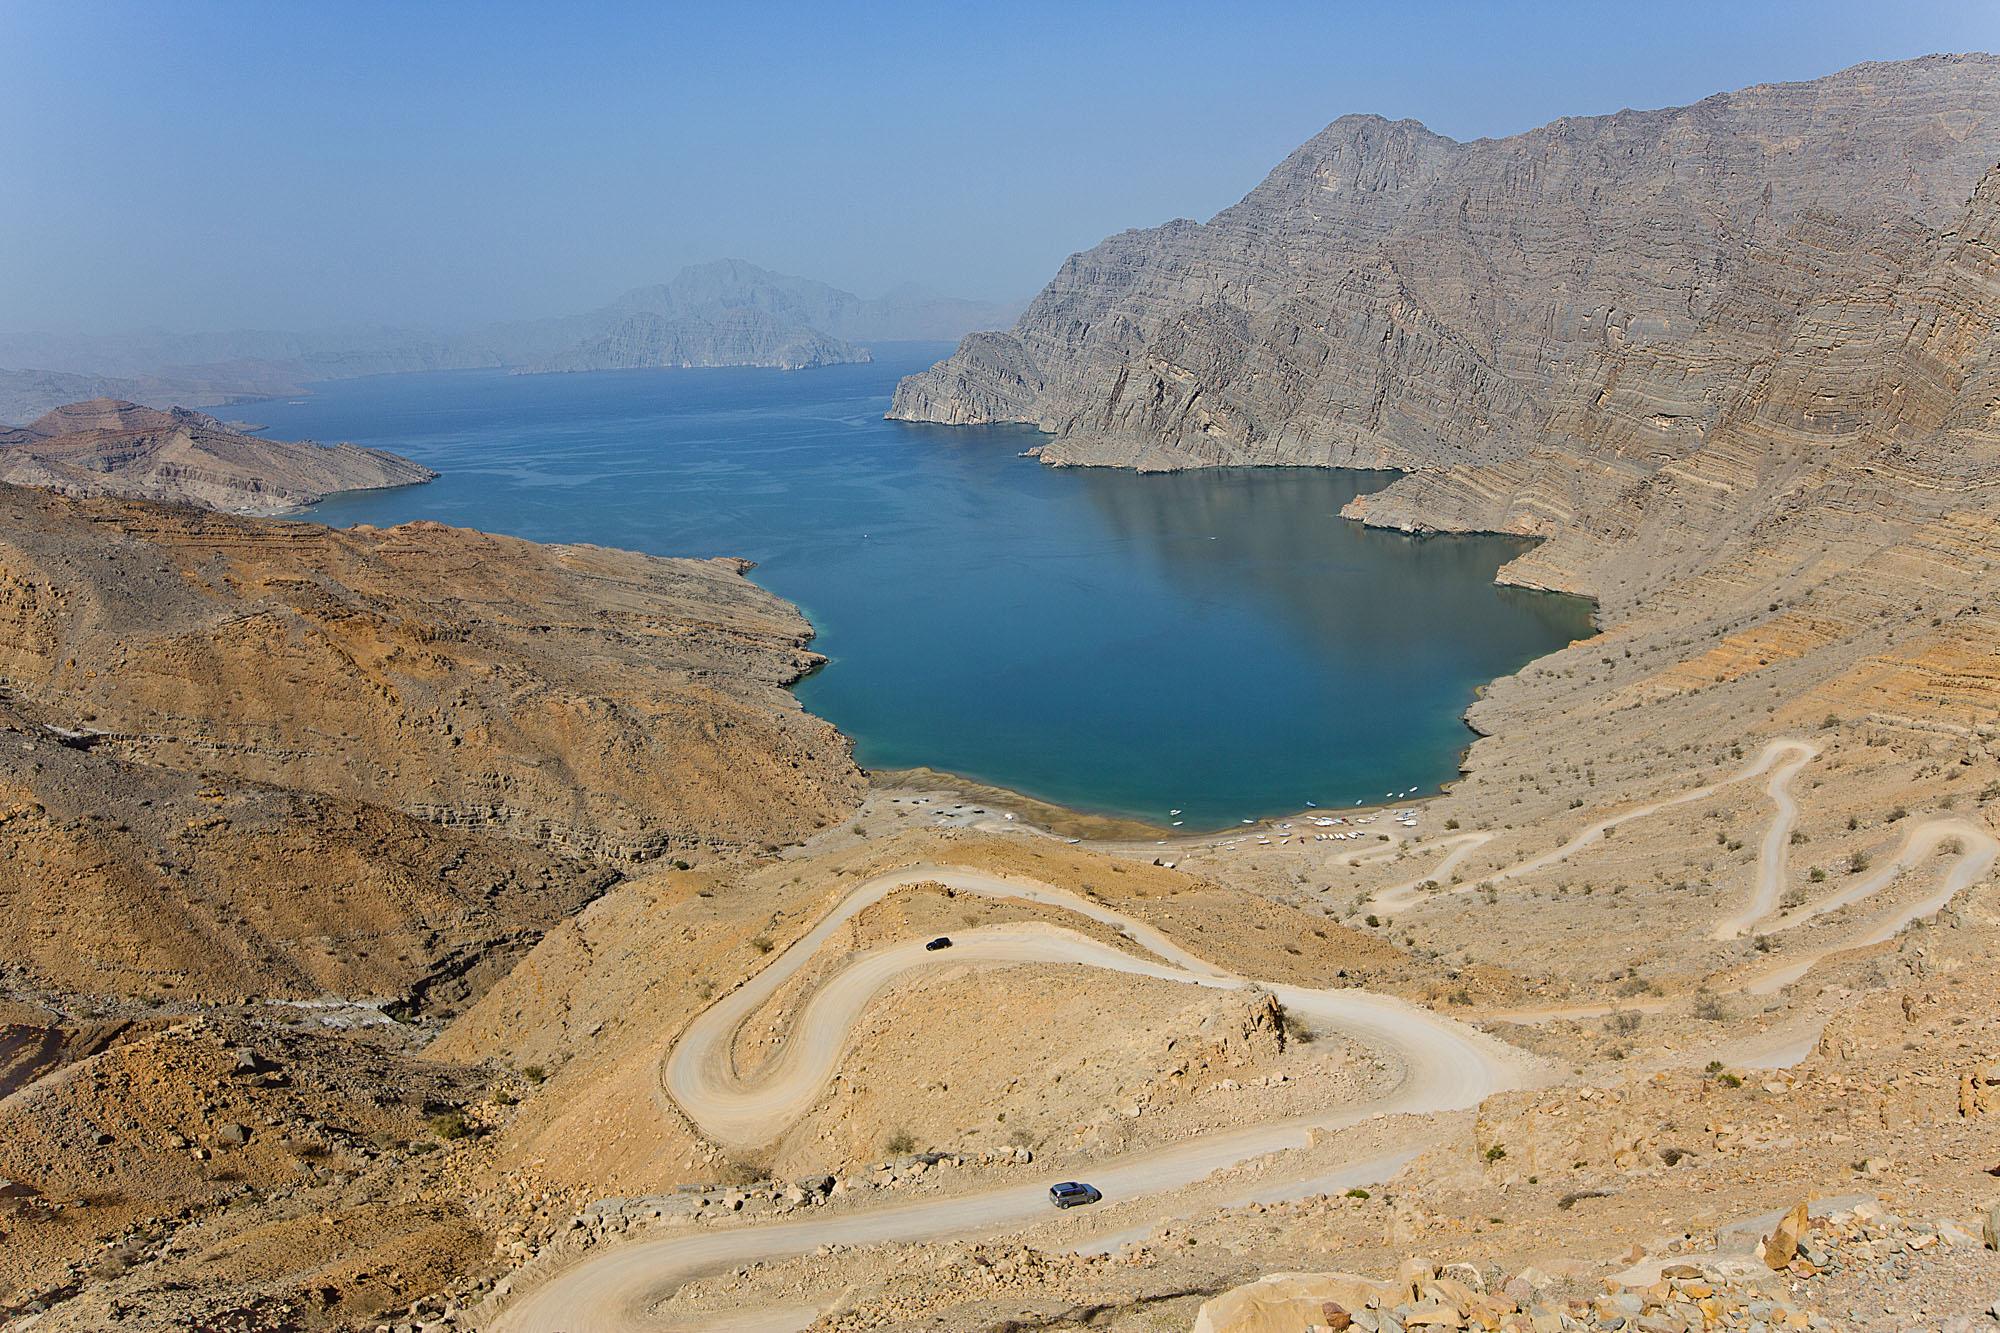 Arabische Halbinsel, Sultanat Oman, Musandam